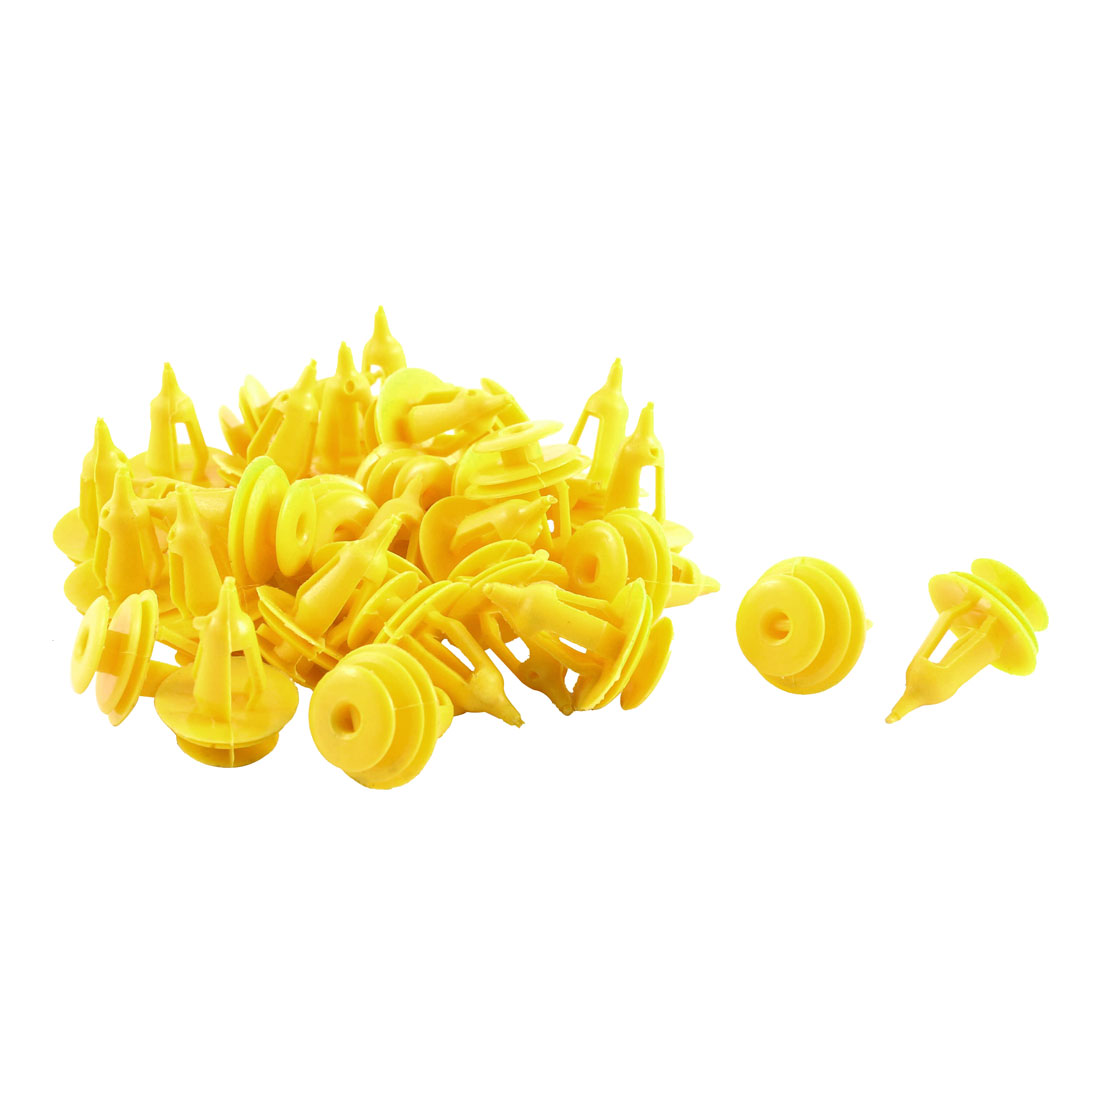 30 Pcs Yellow Plastic Defender Fender Push-Type Mat Clips for